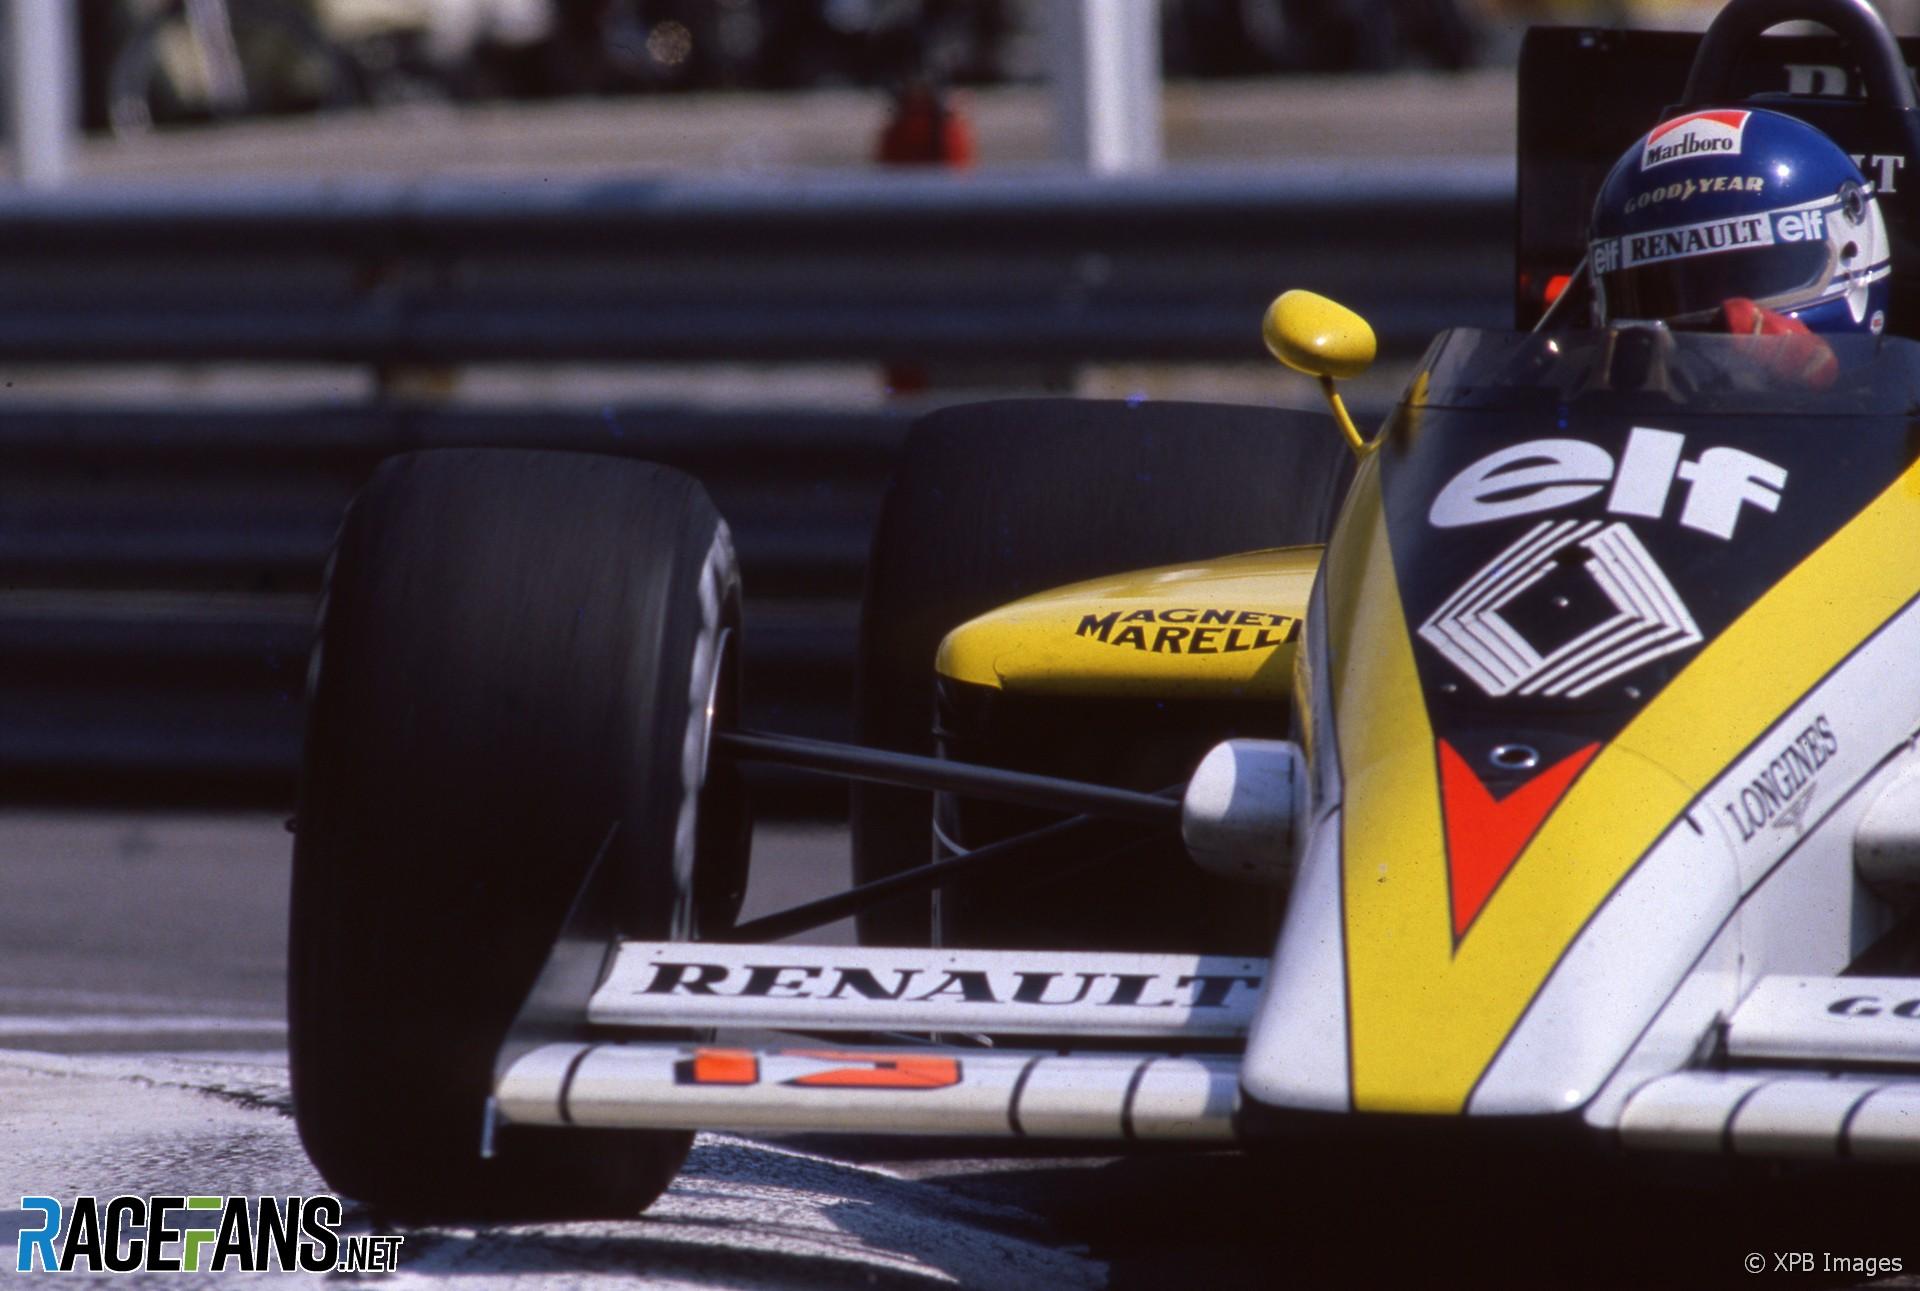 Patrick Tambay, Renault, Monaco, 1985